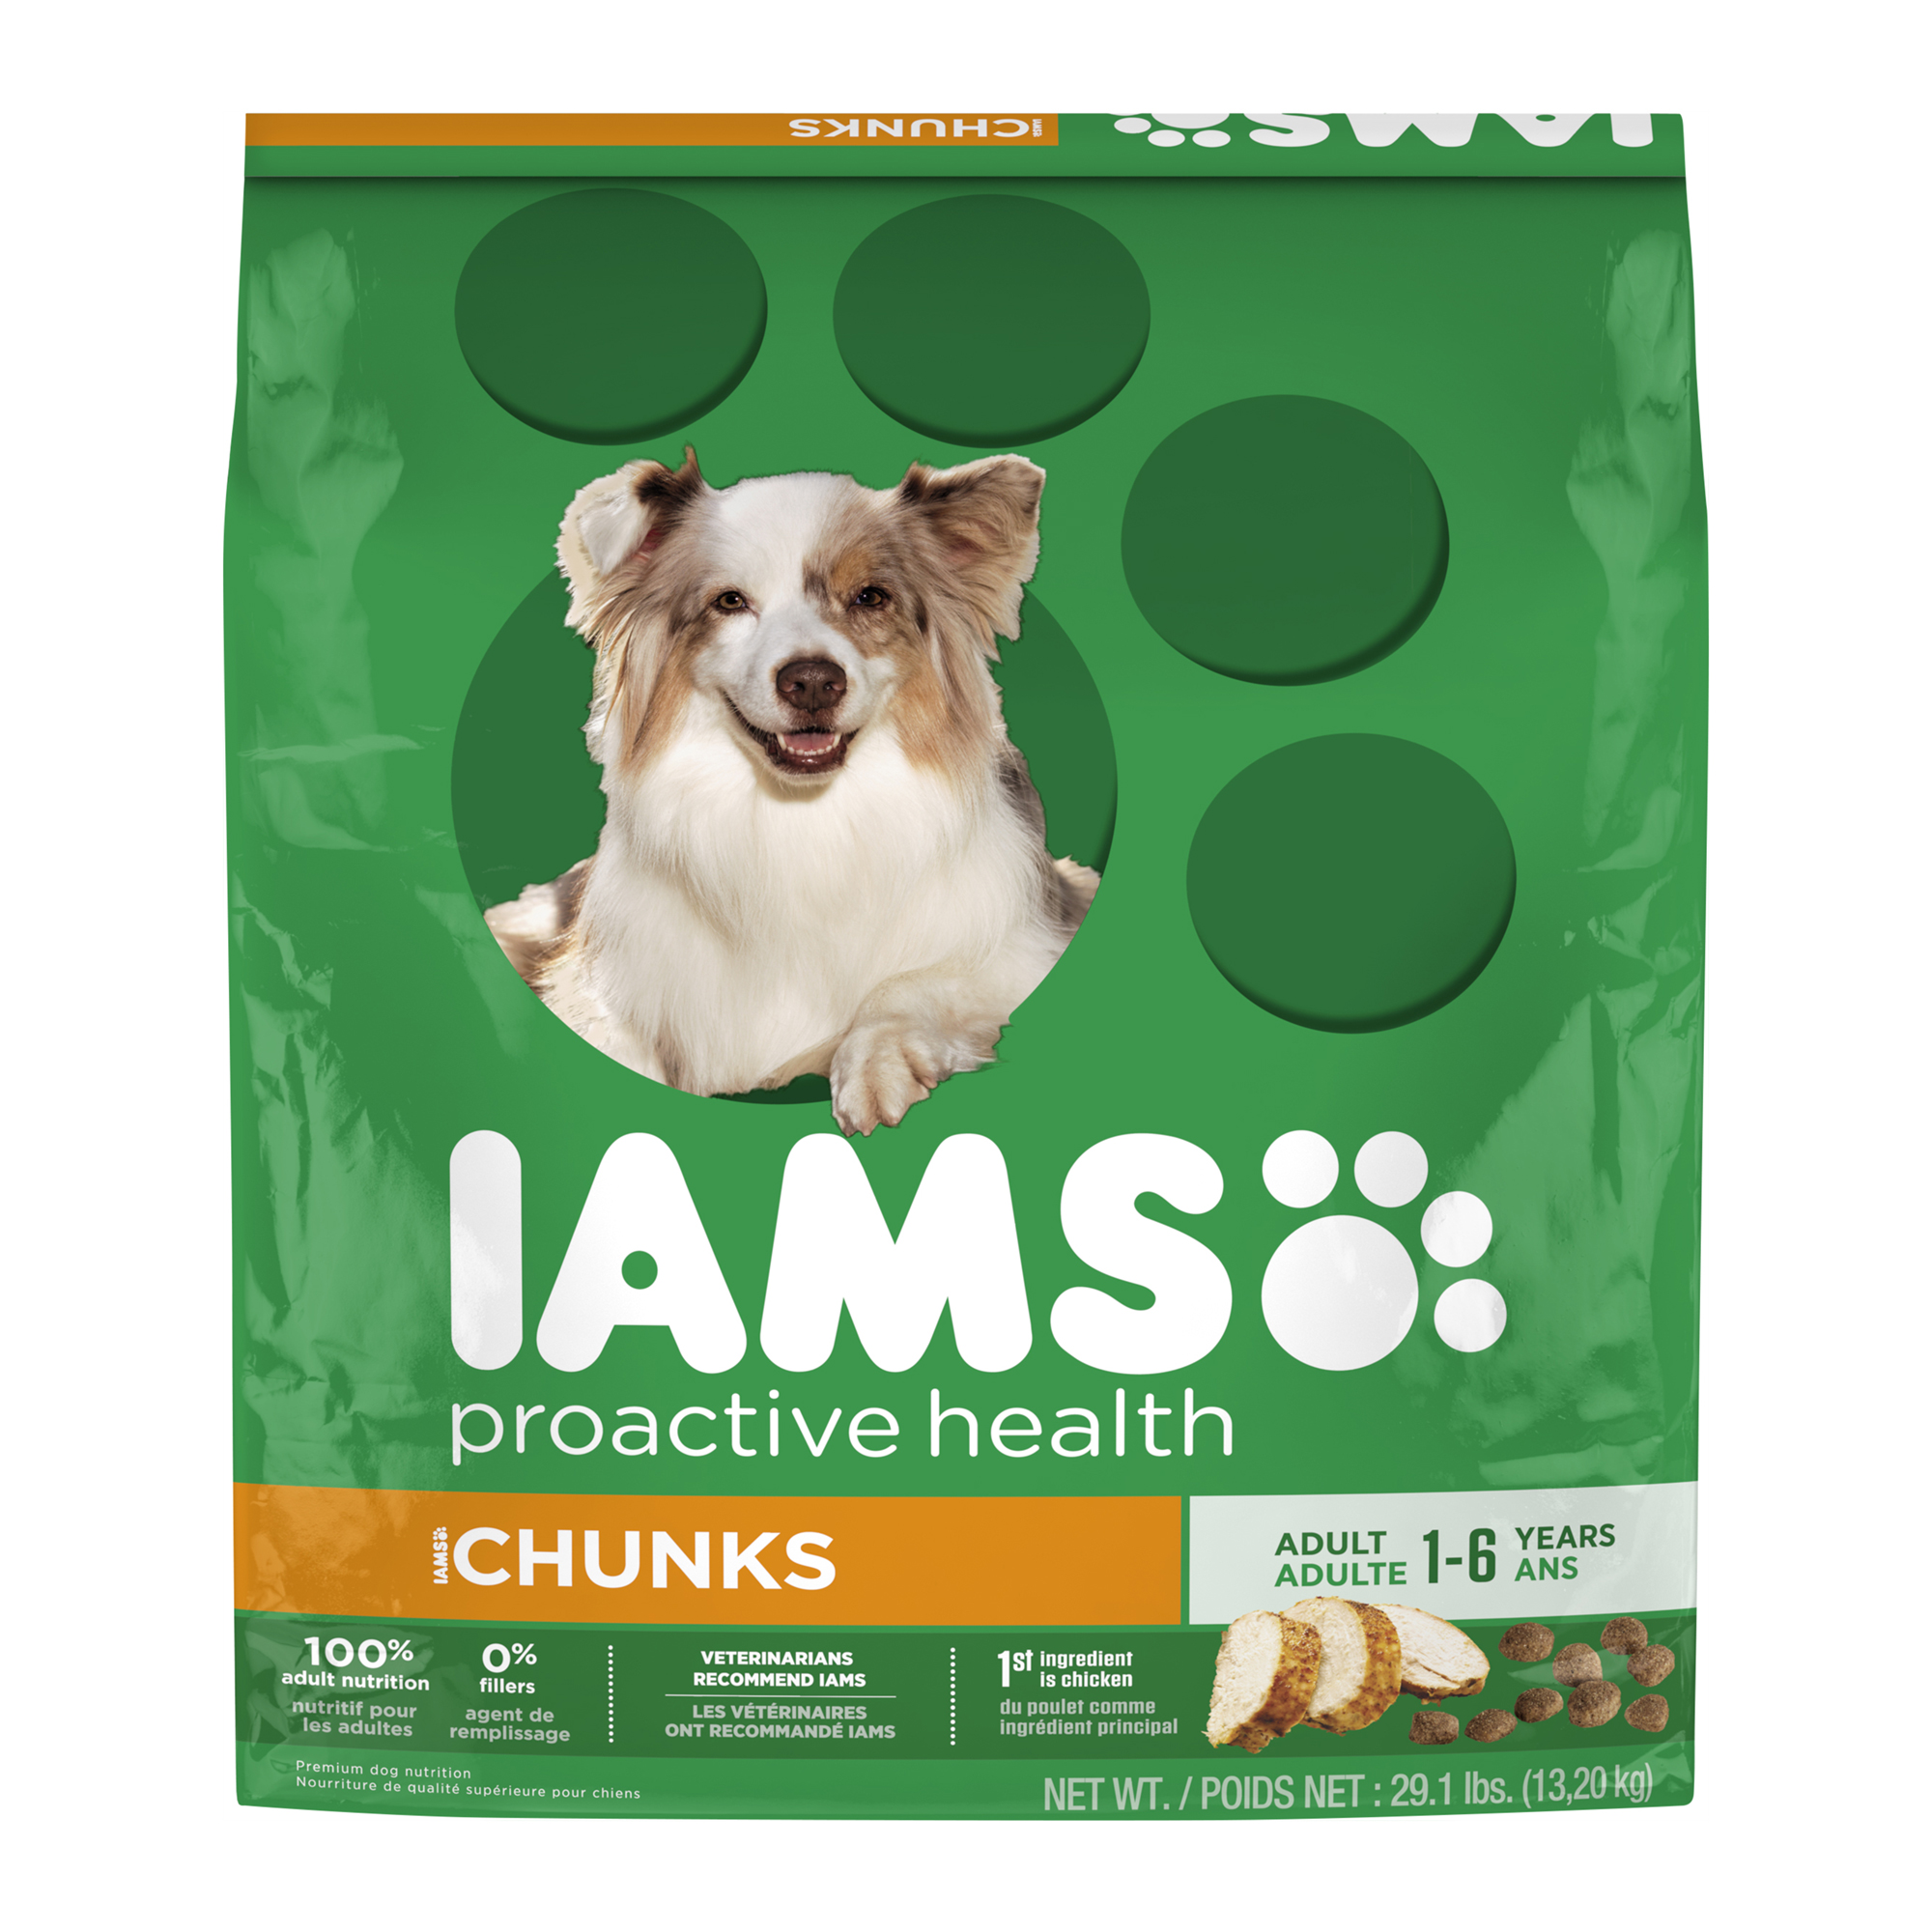 IAMS PROACTIVE HEALTH Adult Chunks Dry Dog Food 29.1 Pounds